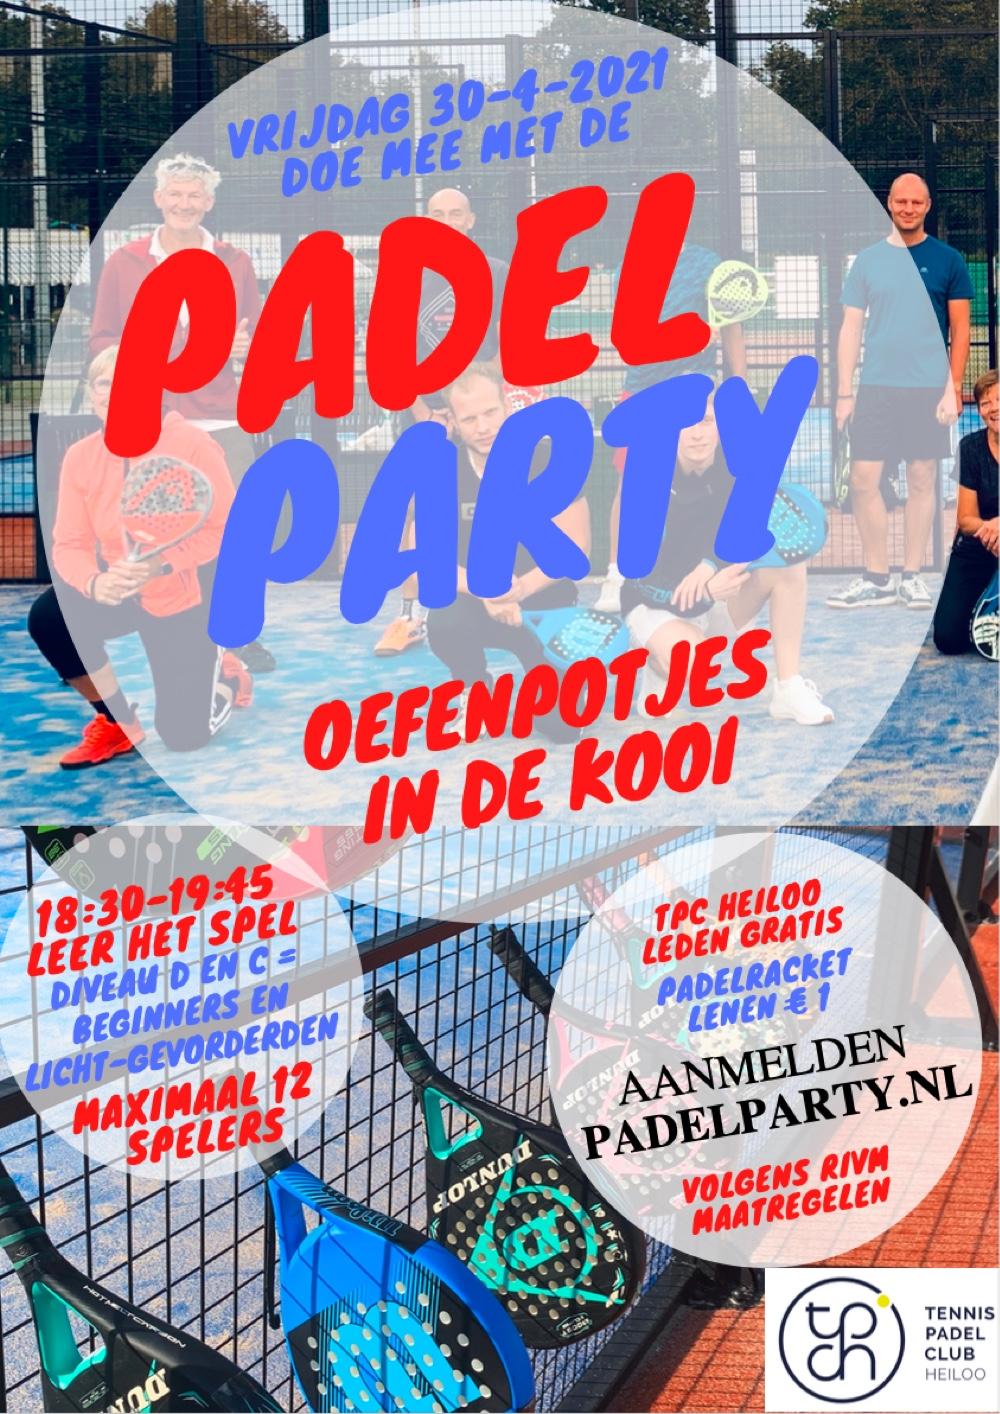 Flyer Padel Party 30 april 2021